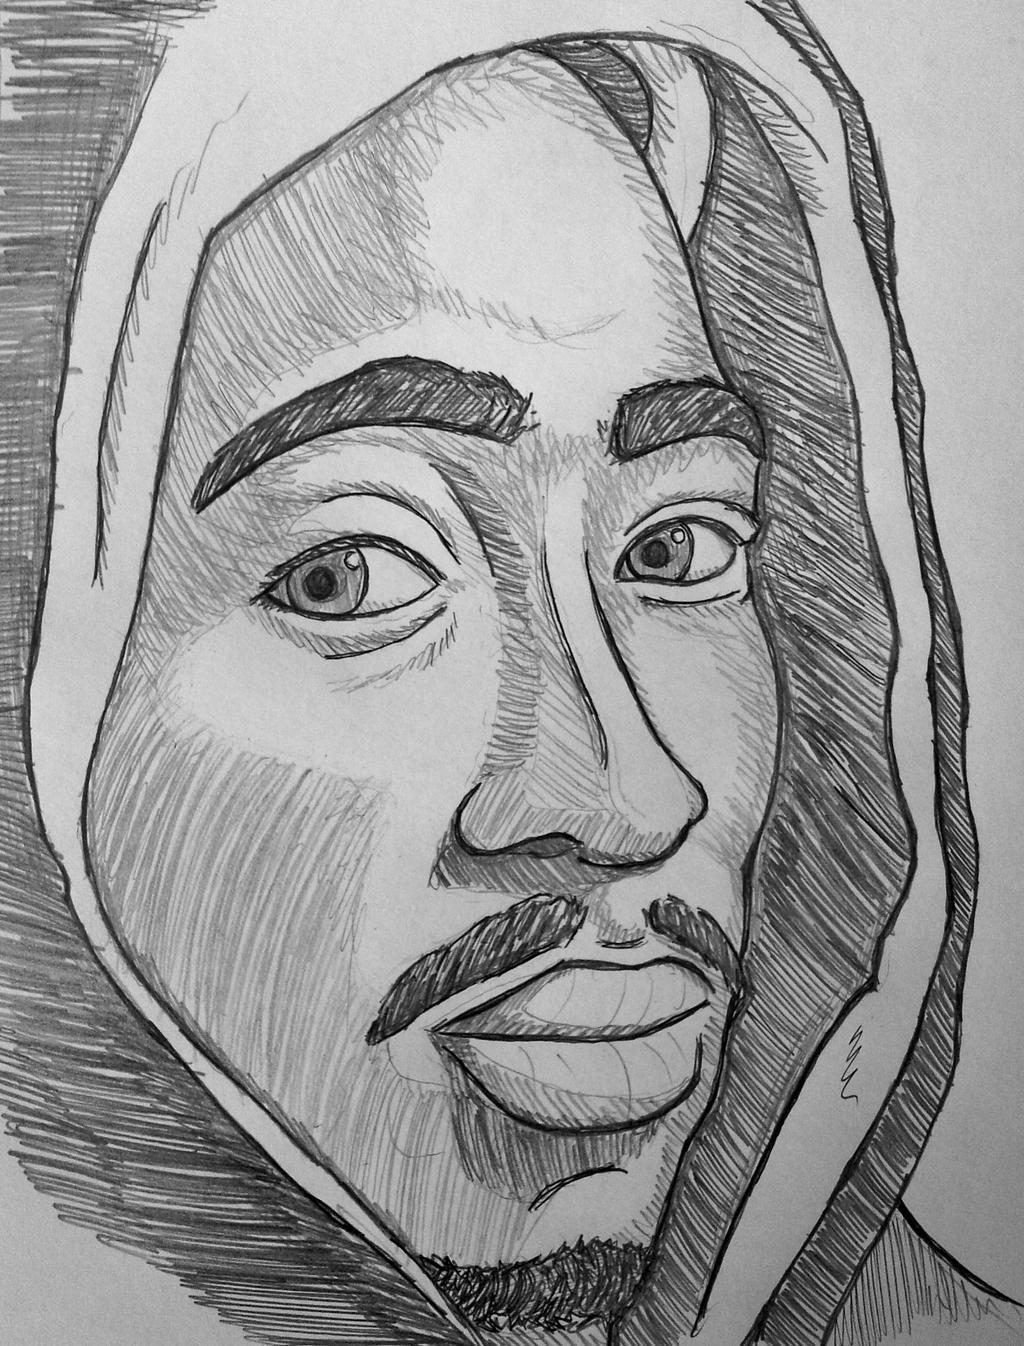 Tupac Shakur by Pietro051 on DeviantArt